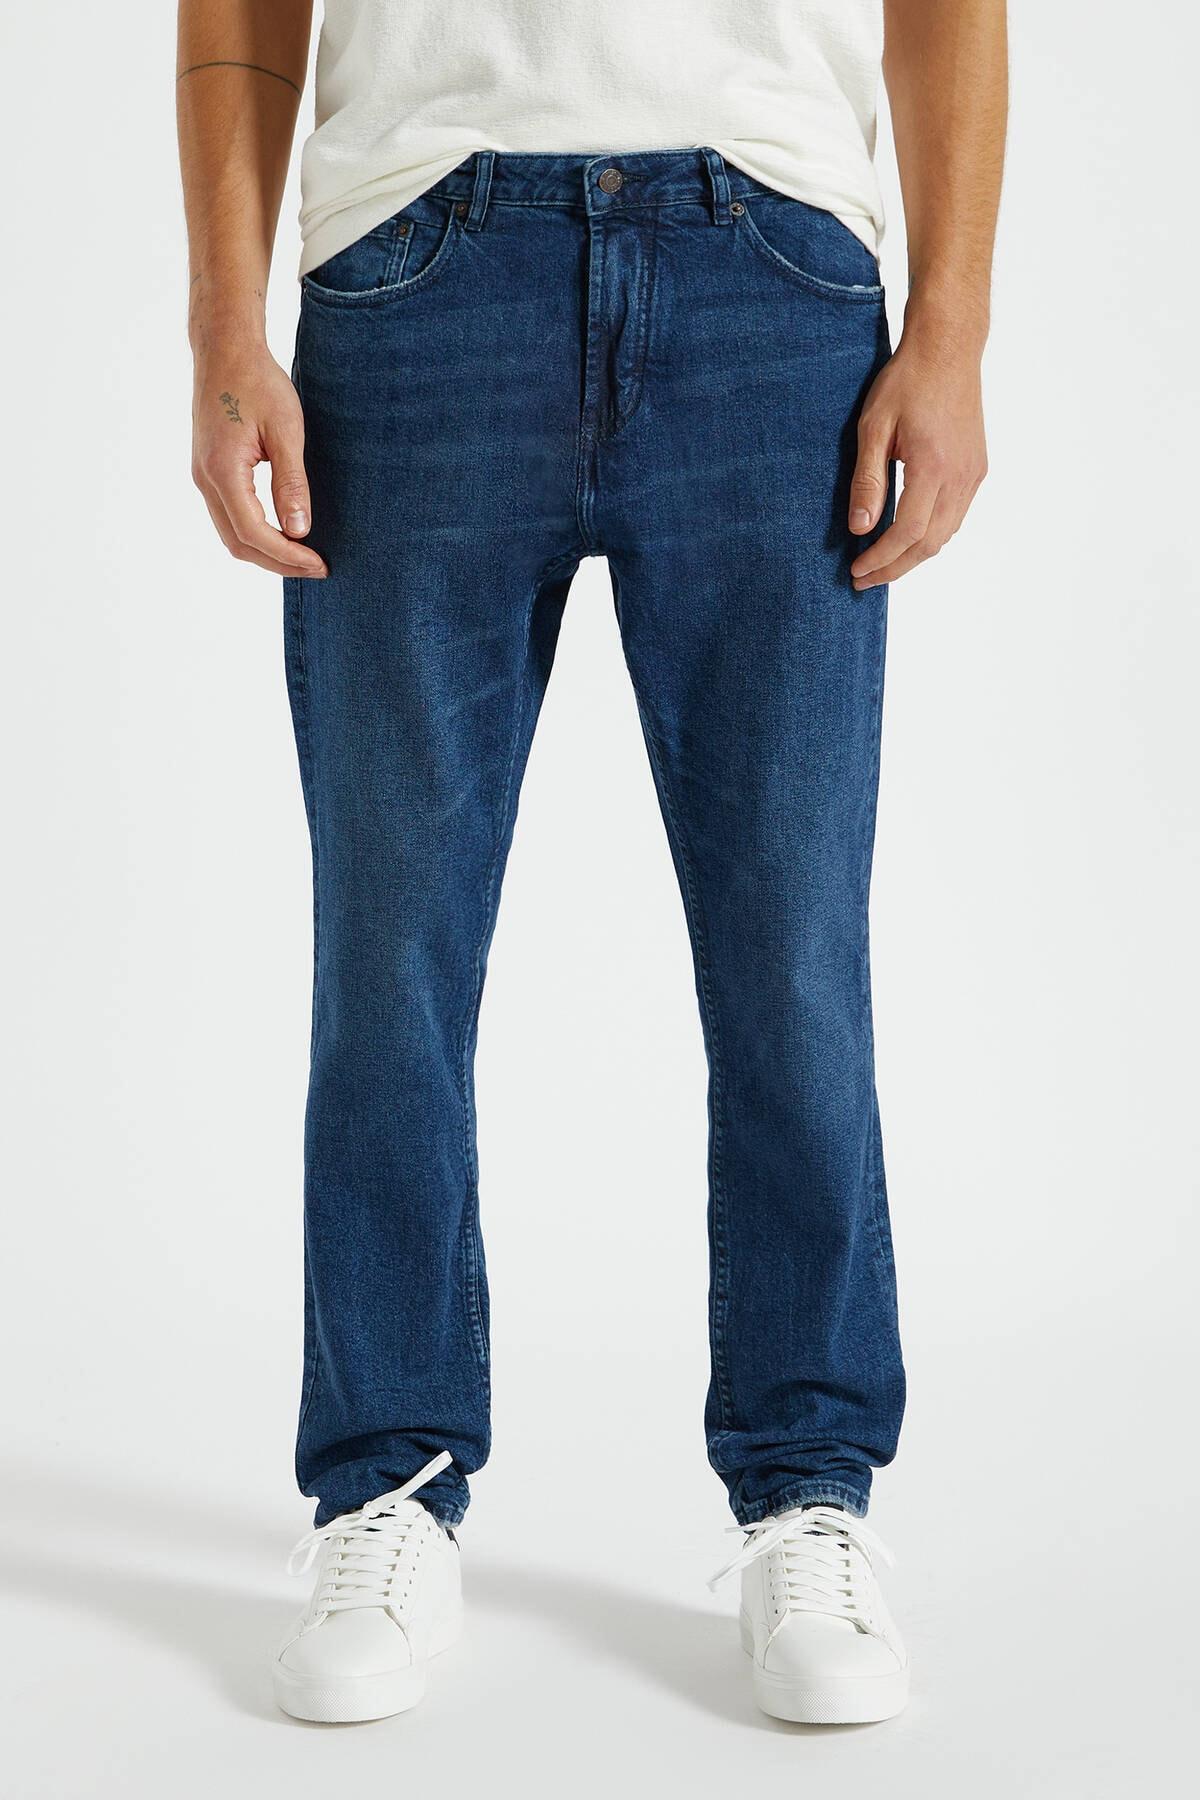 Pull & Bear Erkek Koyu Mavi Comfort Slim Fit Jean 09683530 2